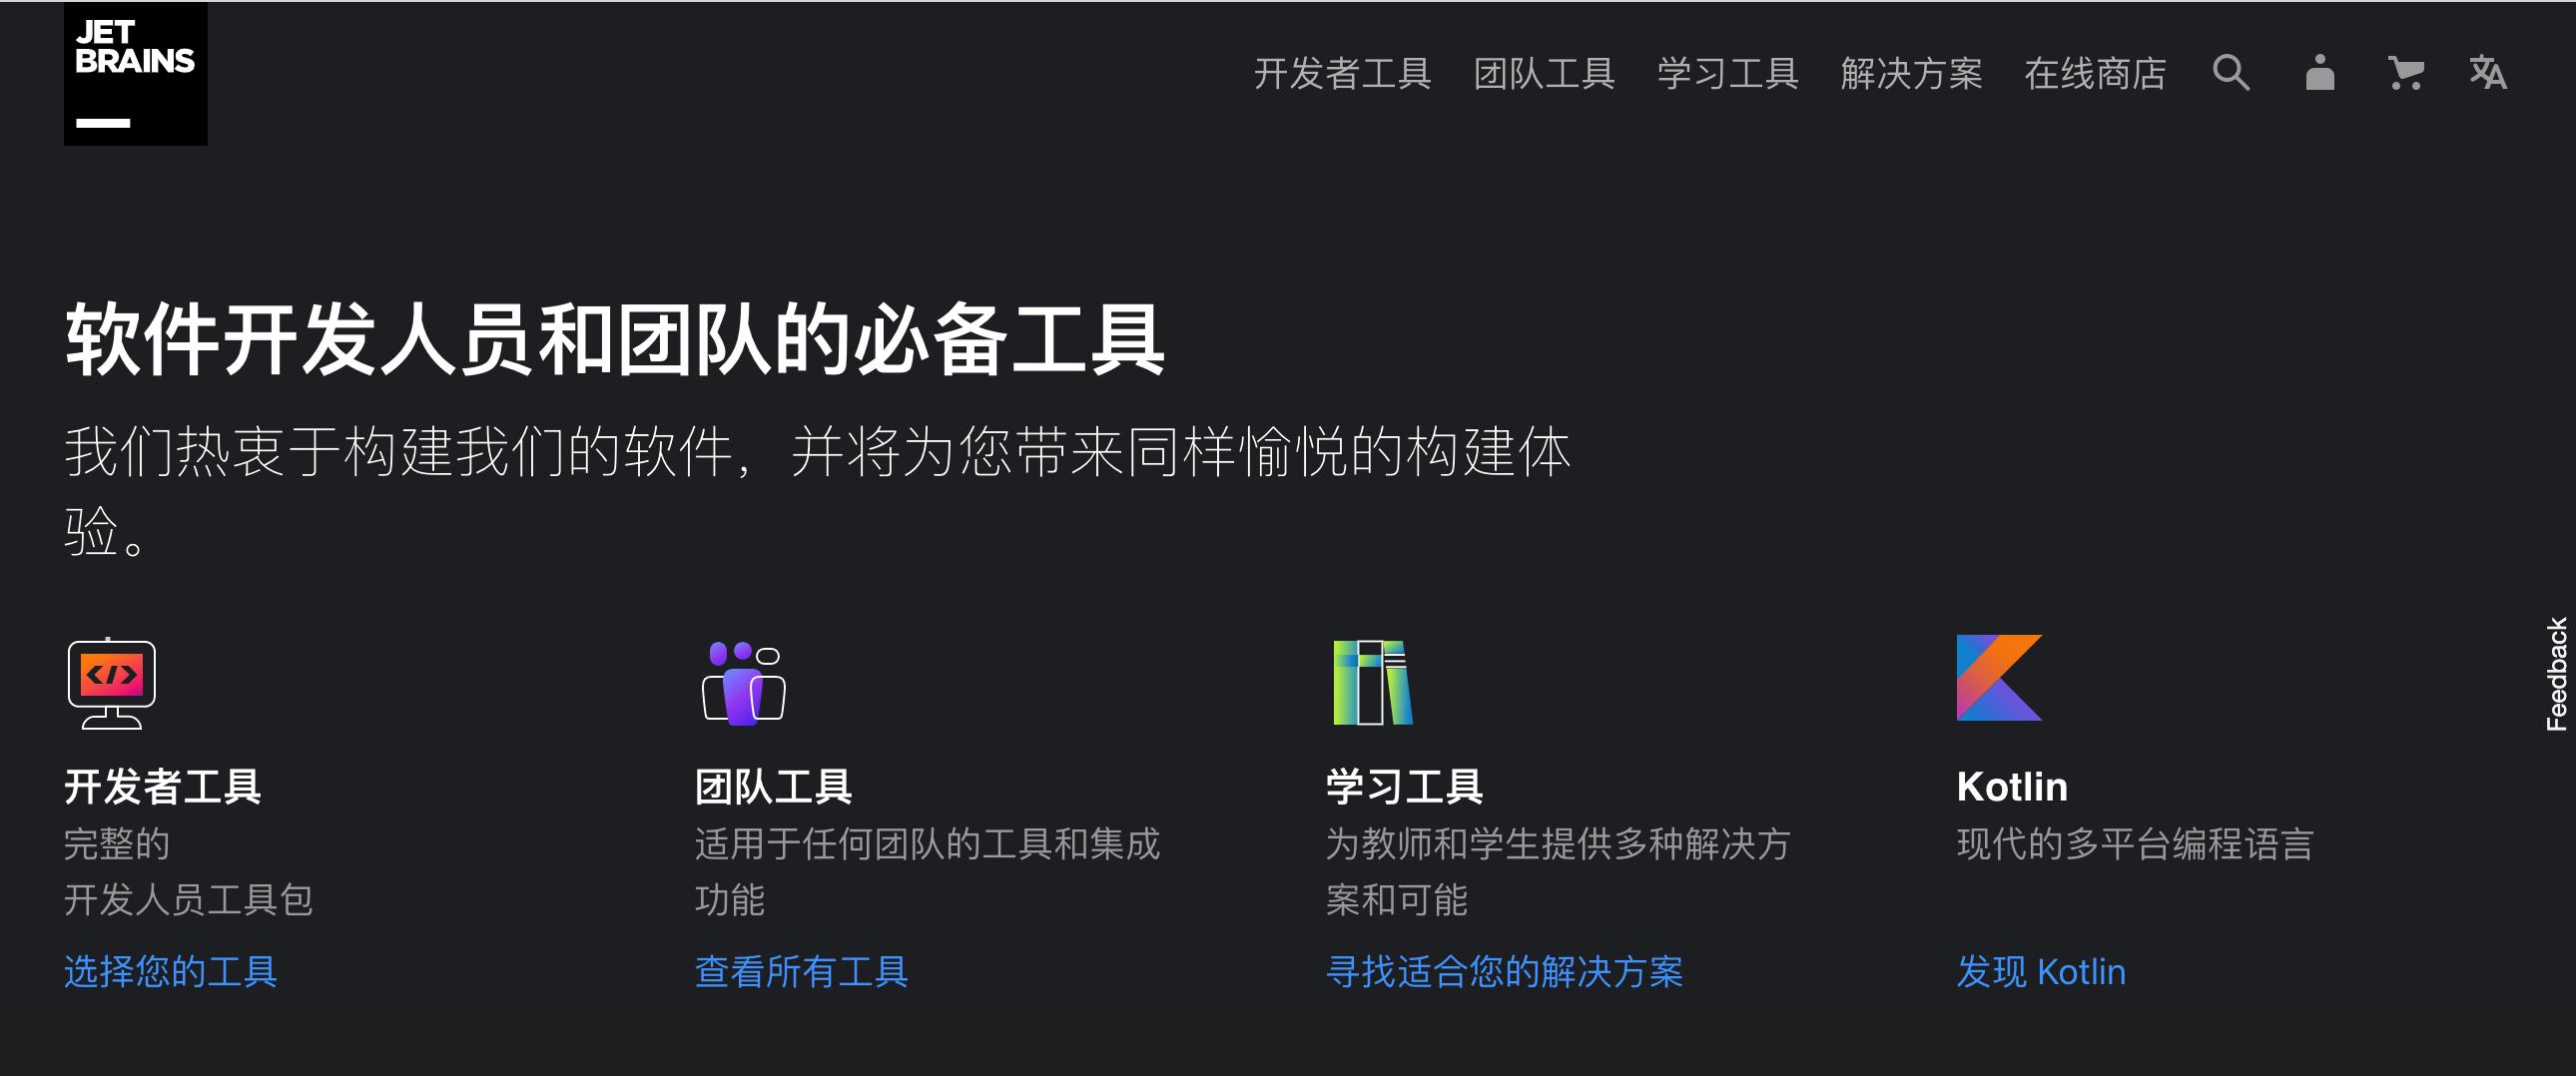 👍JetBrains最新全家桶 2020.3.3 中文破解版 强大的开发必备工具!-马克喵